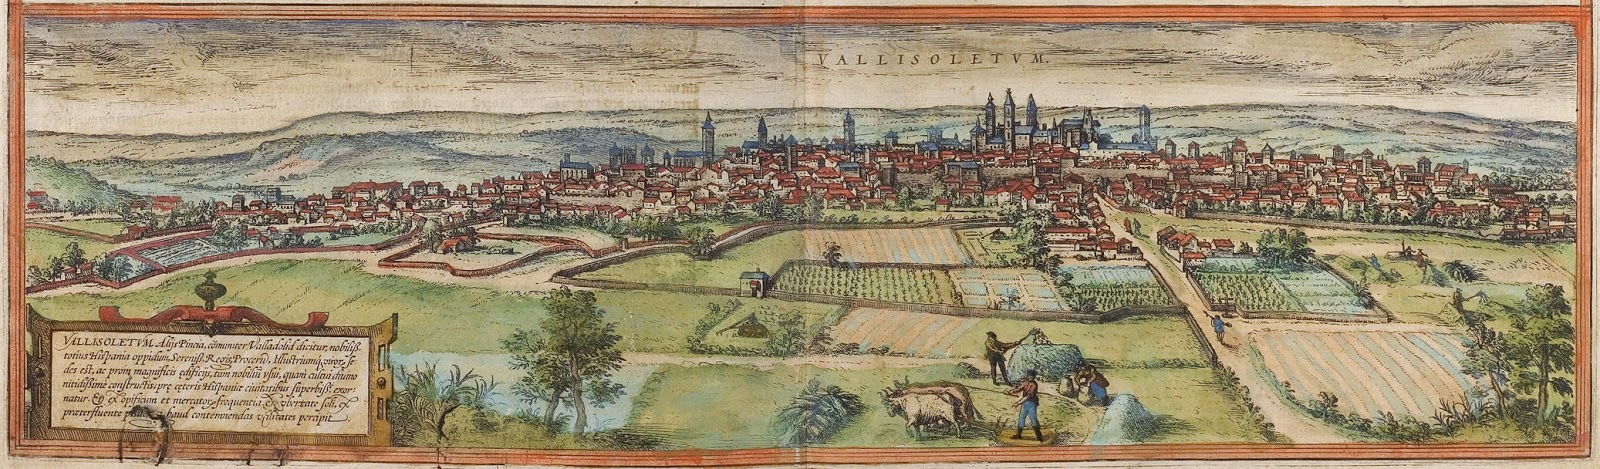 Tal da como hoy en Madrid 5 febrero 1606 Felipe III